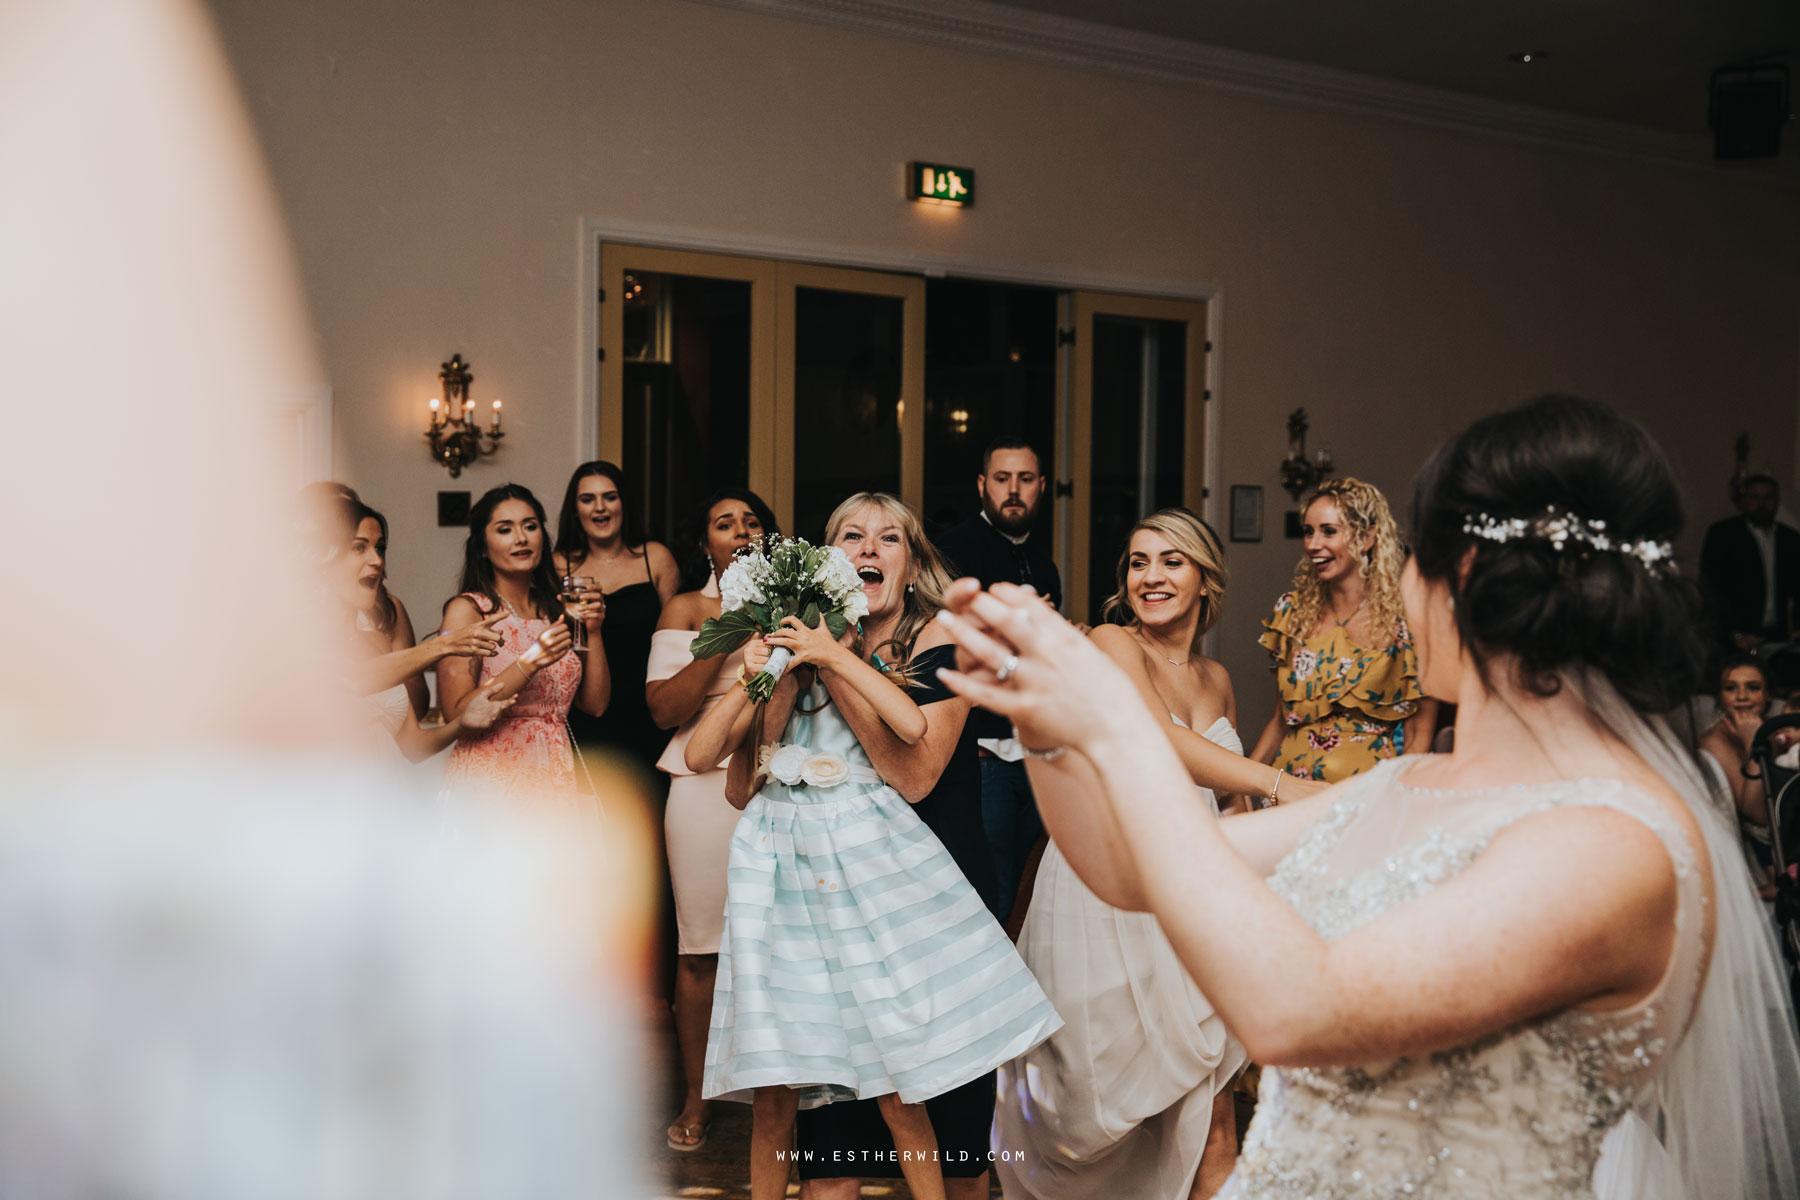 Lynford_Hall_Wedding_Thetford_Mundford_Esther_Wild_Photographer_IMG_4134.jpg